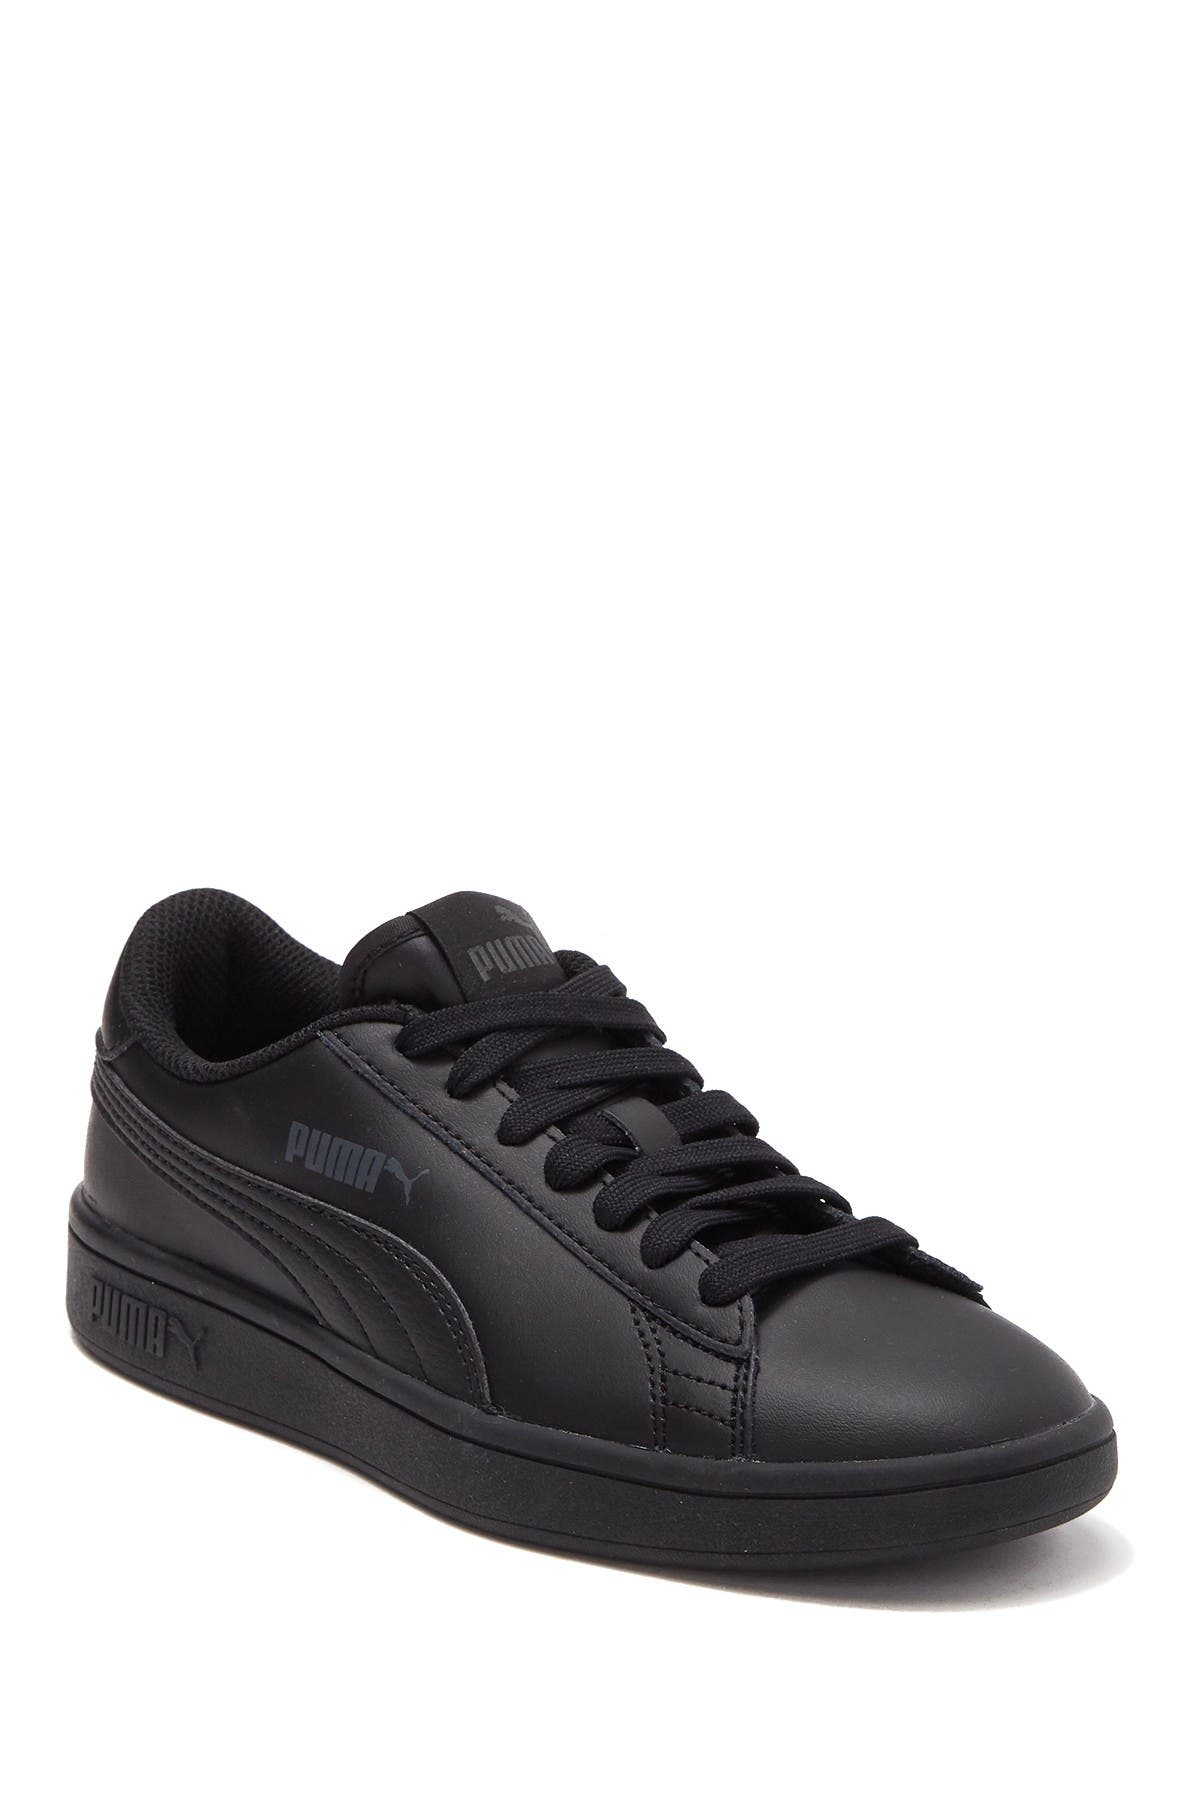 PUMA   Smash V2 L JR Leather Sneaker